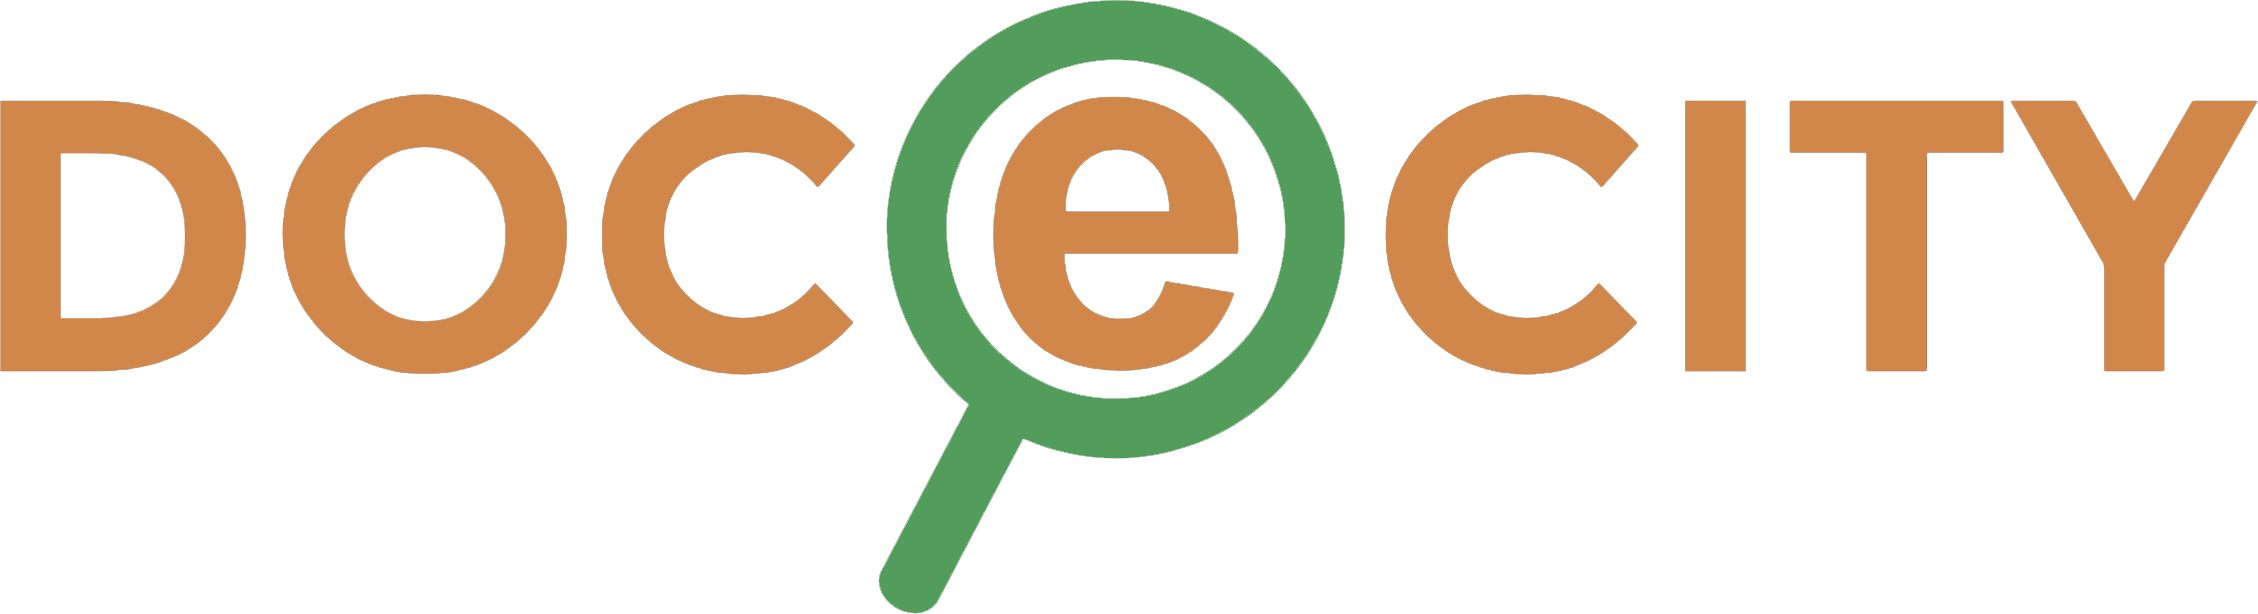 PeopleSoft 9.2 & PeopleTools 8.5.3 Upgrade Project.